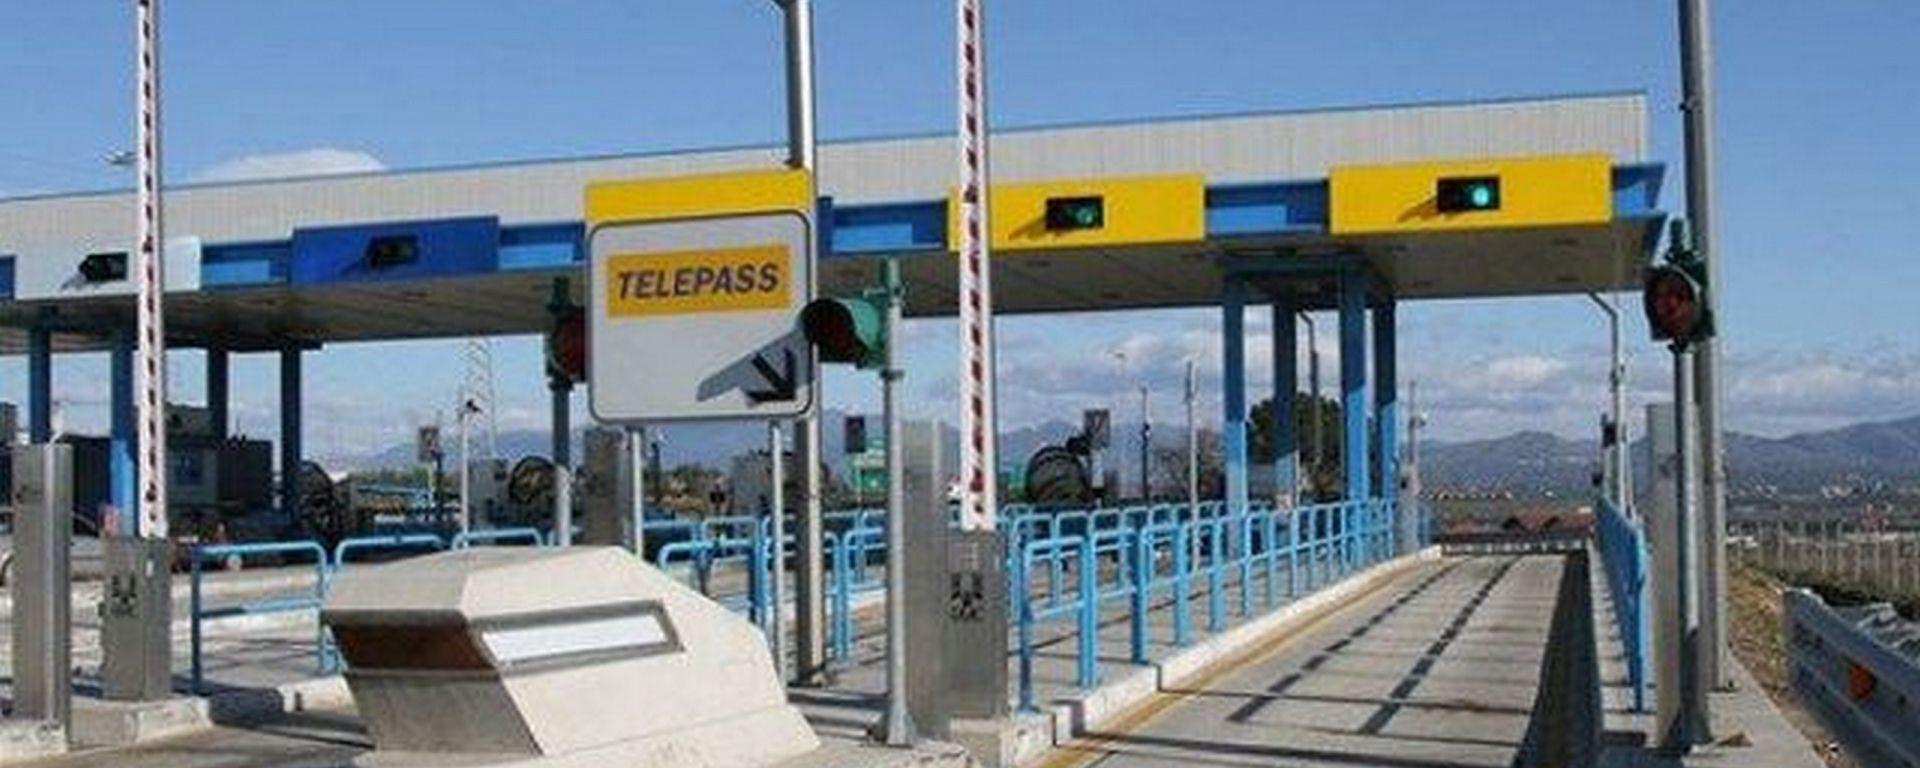 Telepass Pay, per pagare benzina, parcheggi, car sharing e multe